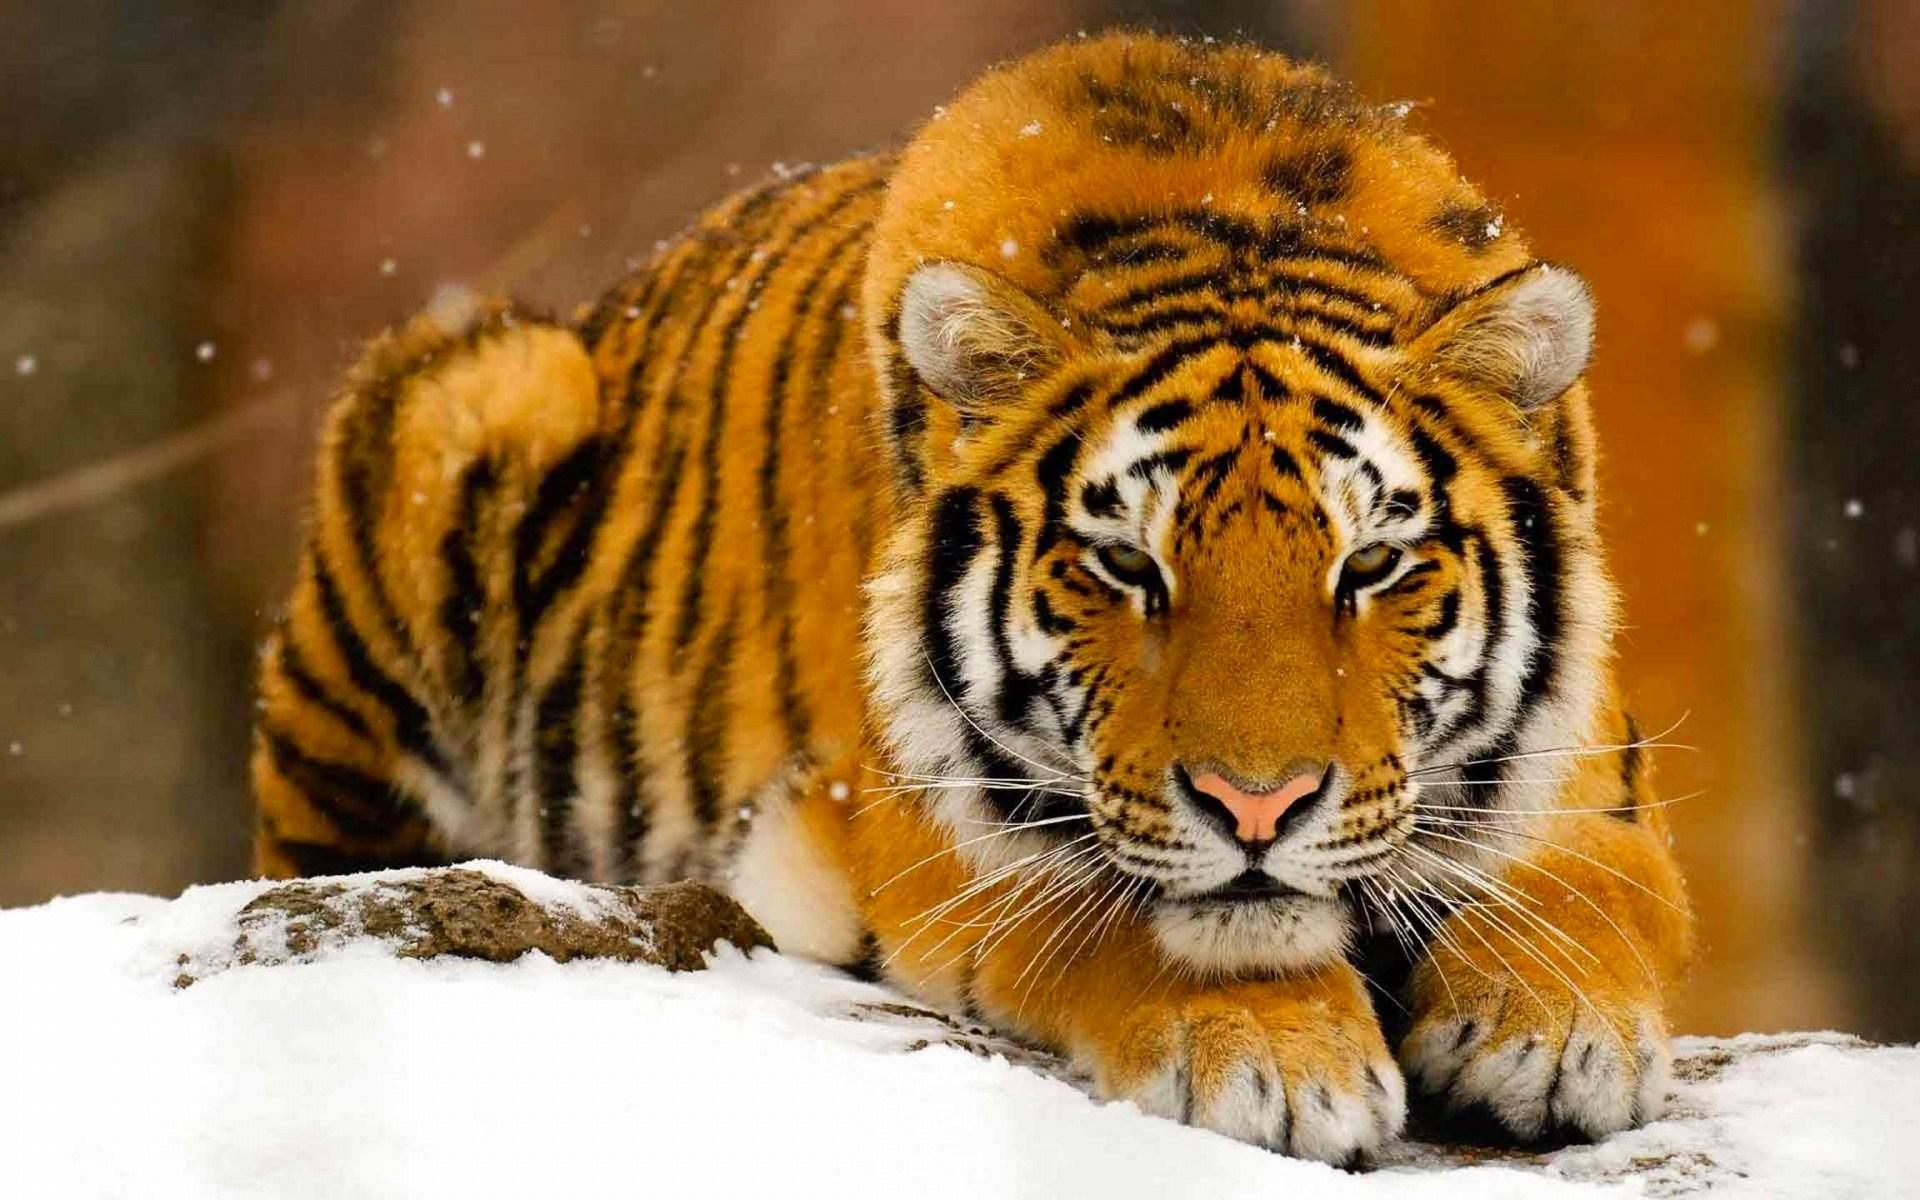 T l charger fonds d 39 cran tigre des neiges gratuitement - Images tigres gratuites ...